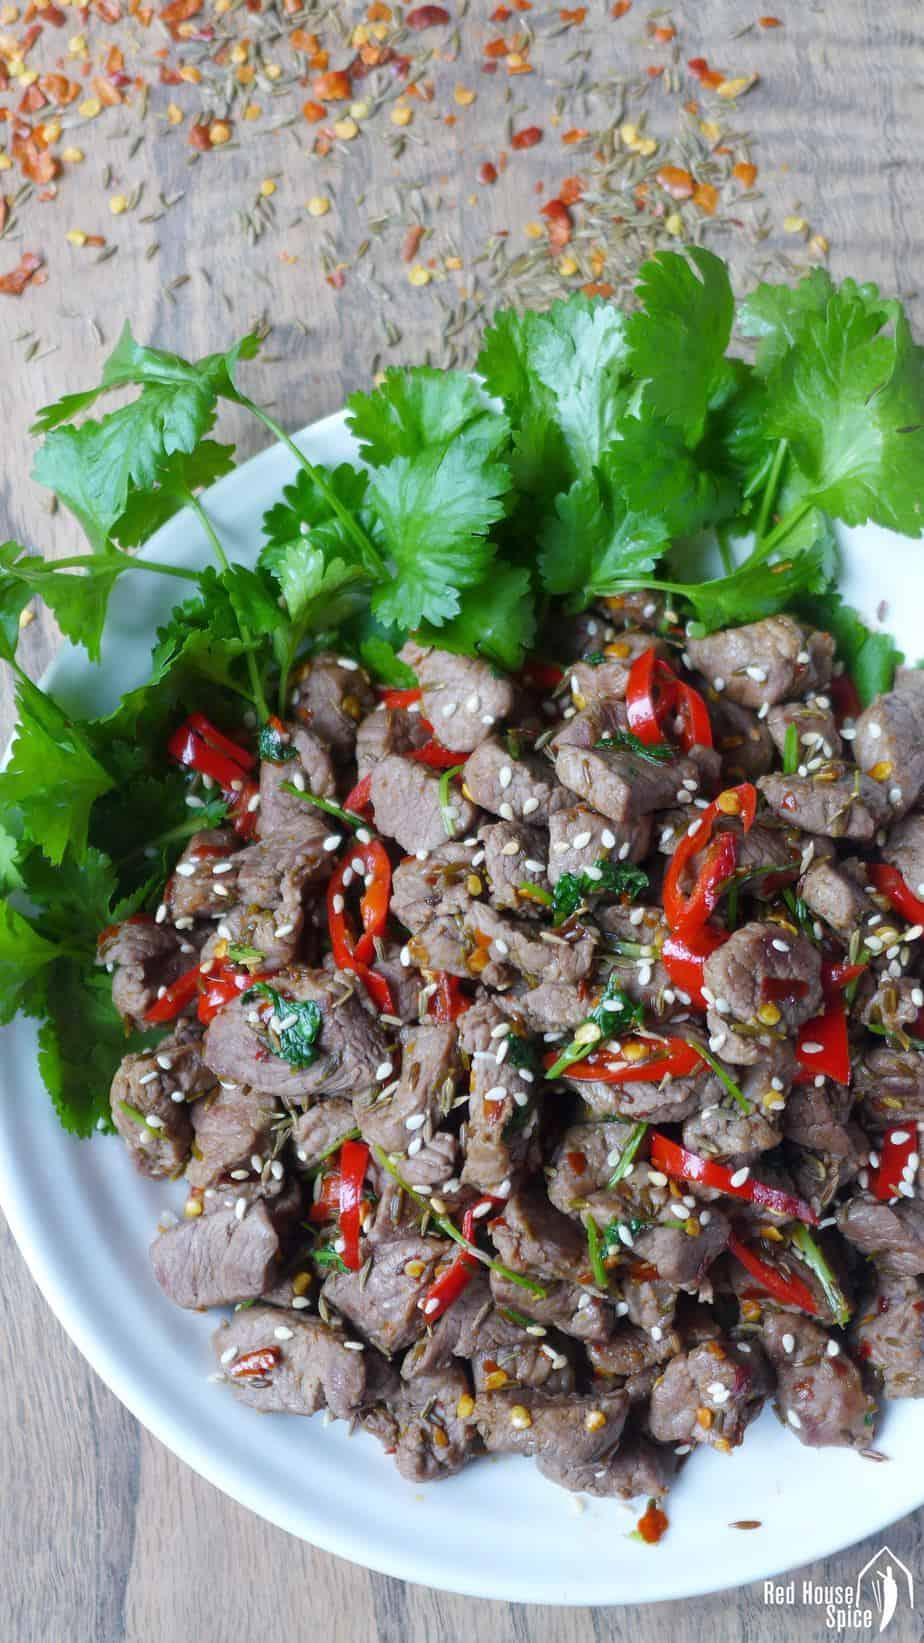 Lamb stir-fry seasoned with cumin & chilli